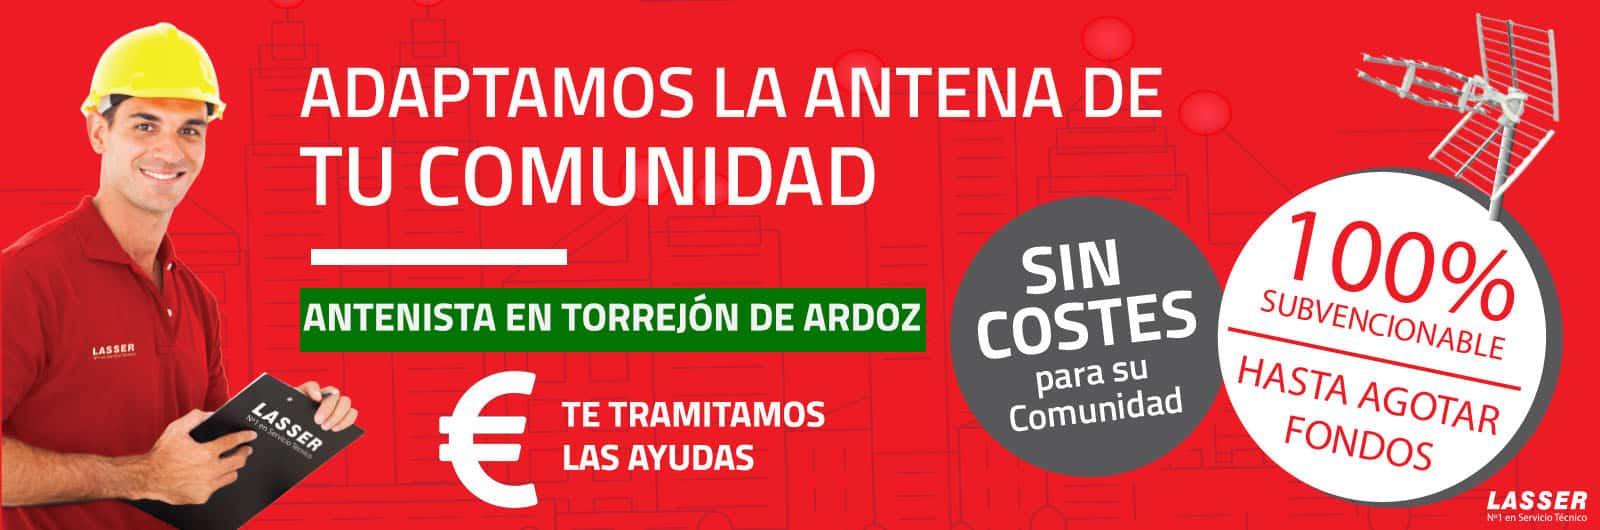 segundo-dividendo-digital-antena-comunidades-promocion-torrejon-de-ardoz